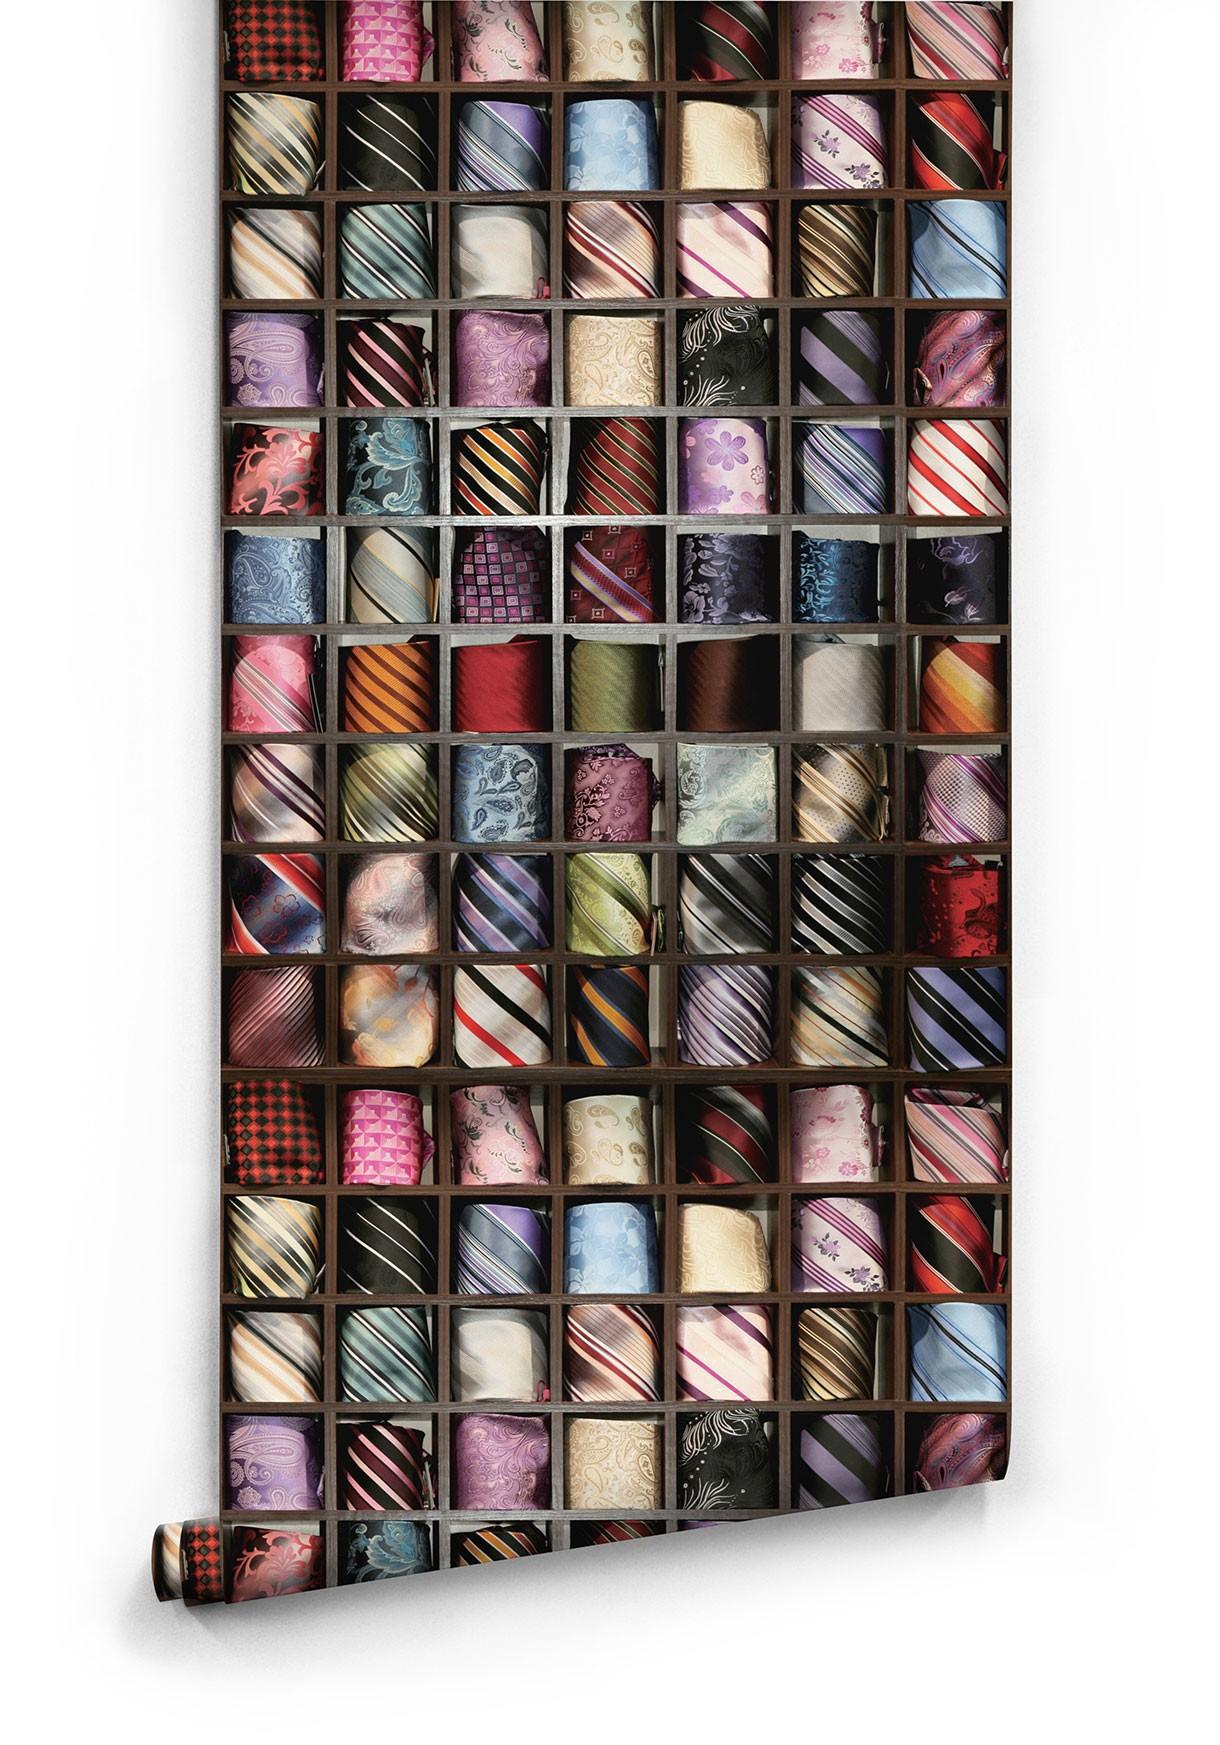 Tie holder wallpaper roll ZYIKHHR